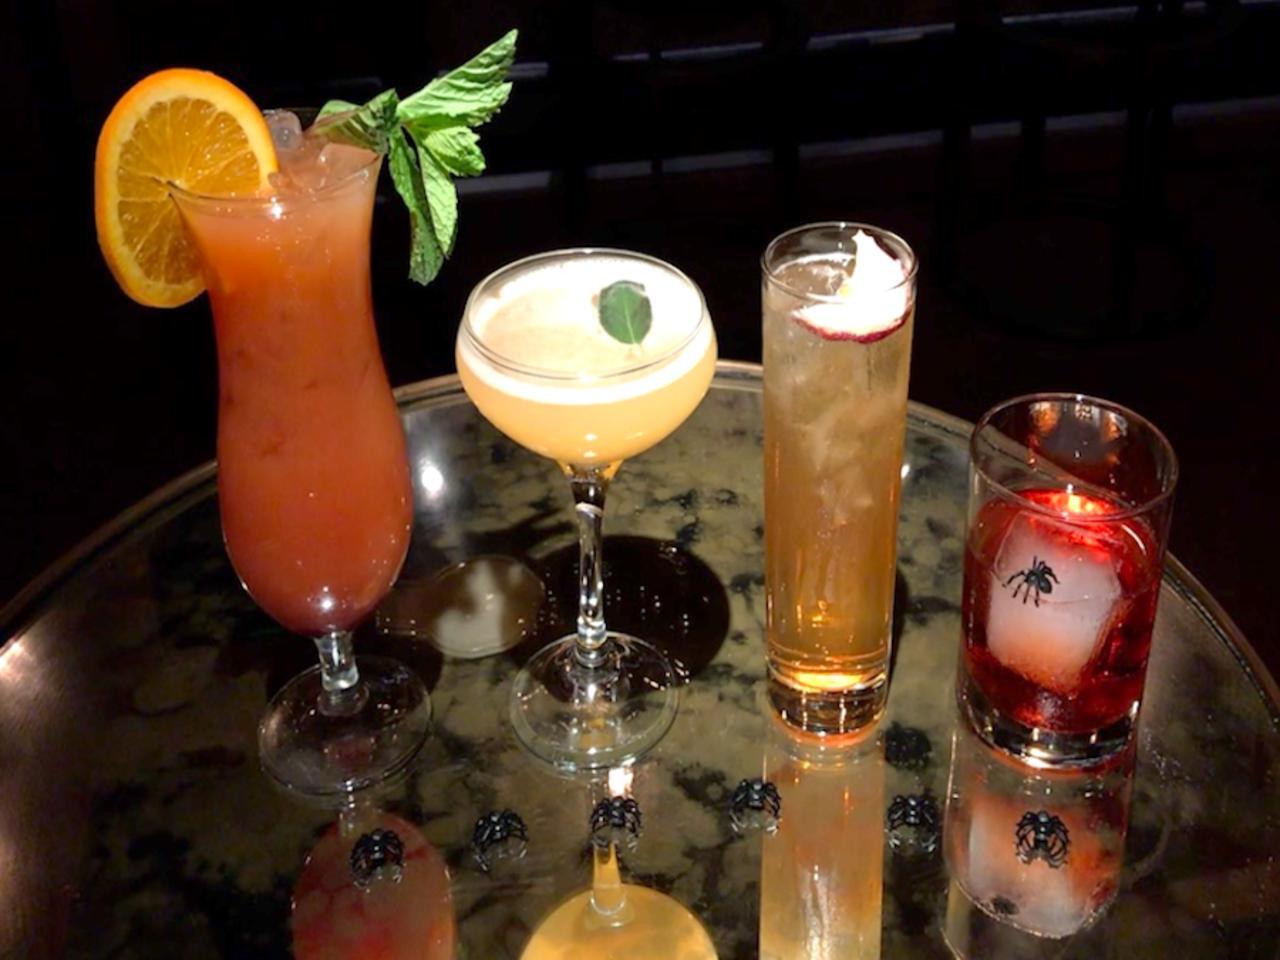 SPOOKY SPEAKEASY! Halloween drinks at Captain's Cabin - ABC15 Digital